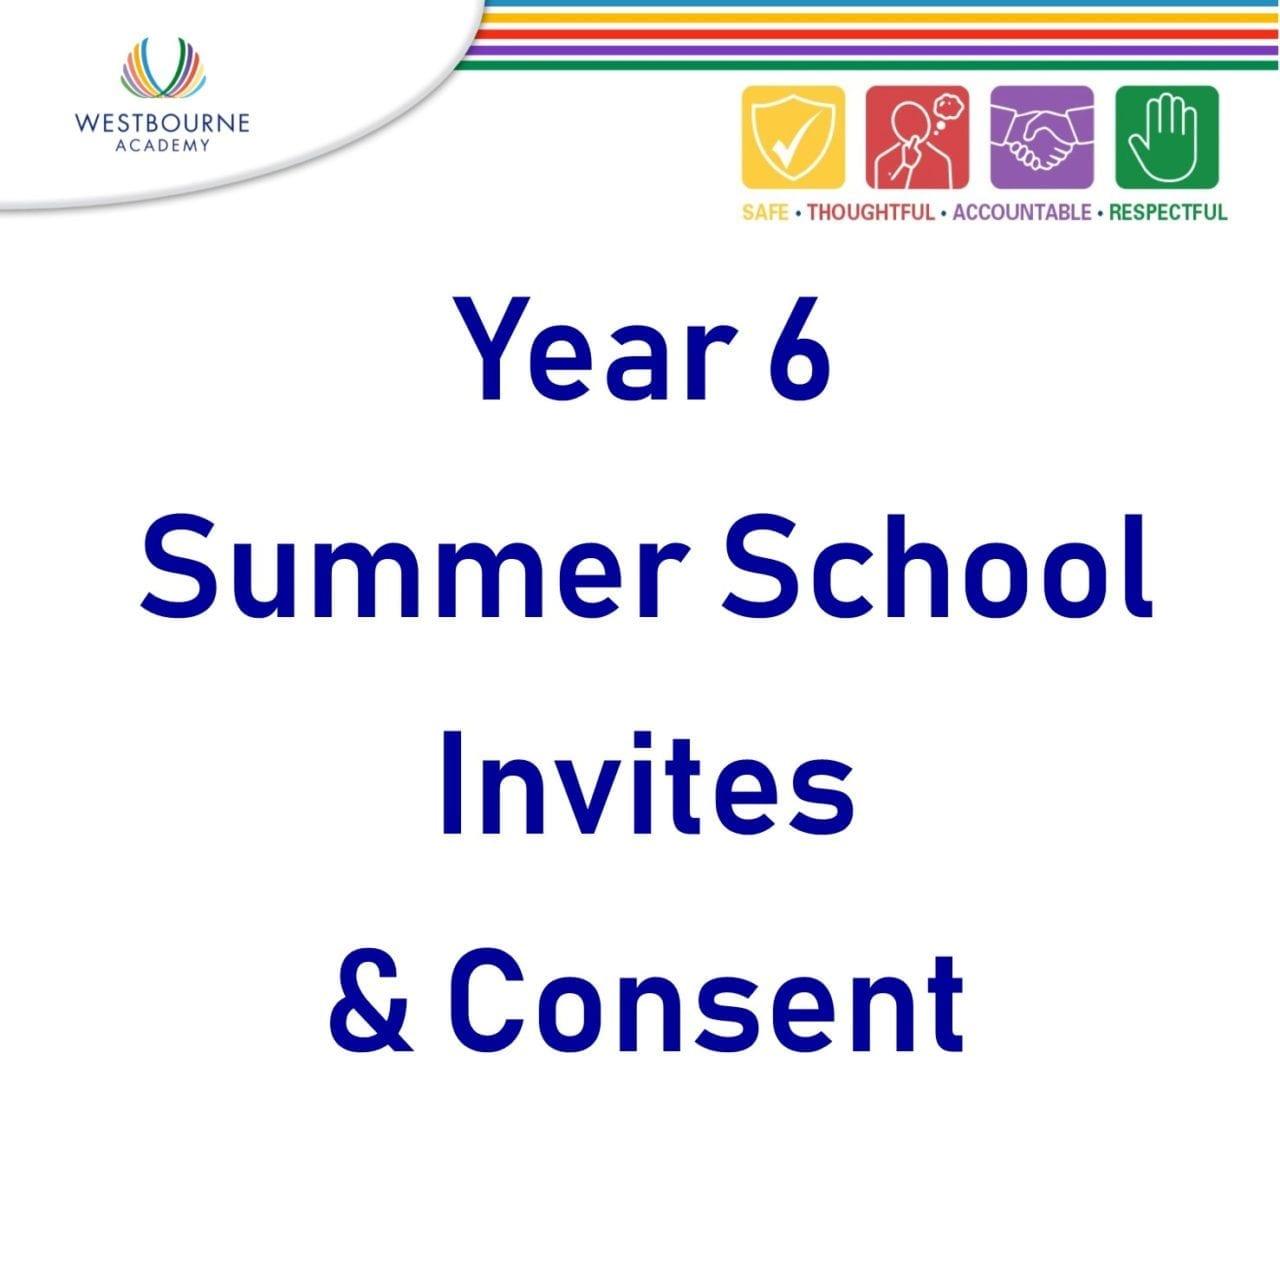 Year 6 Summer School Invites & Consents